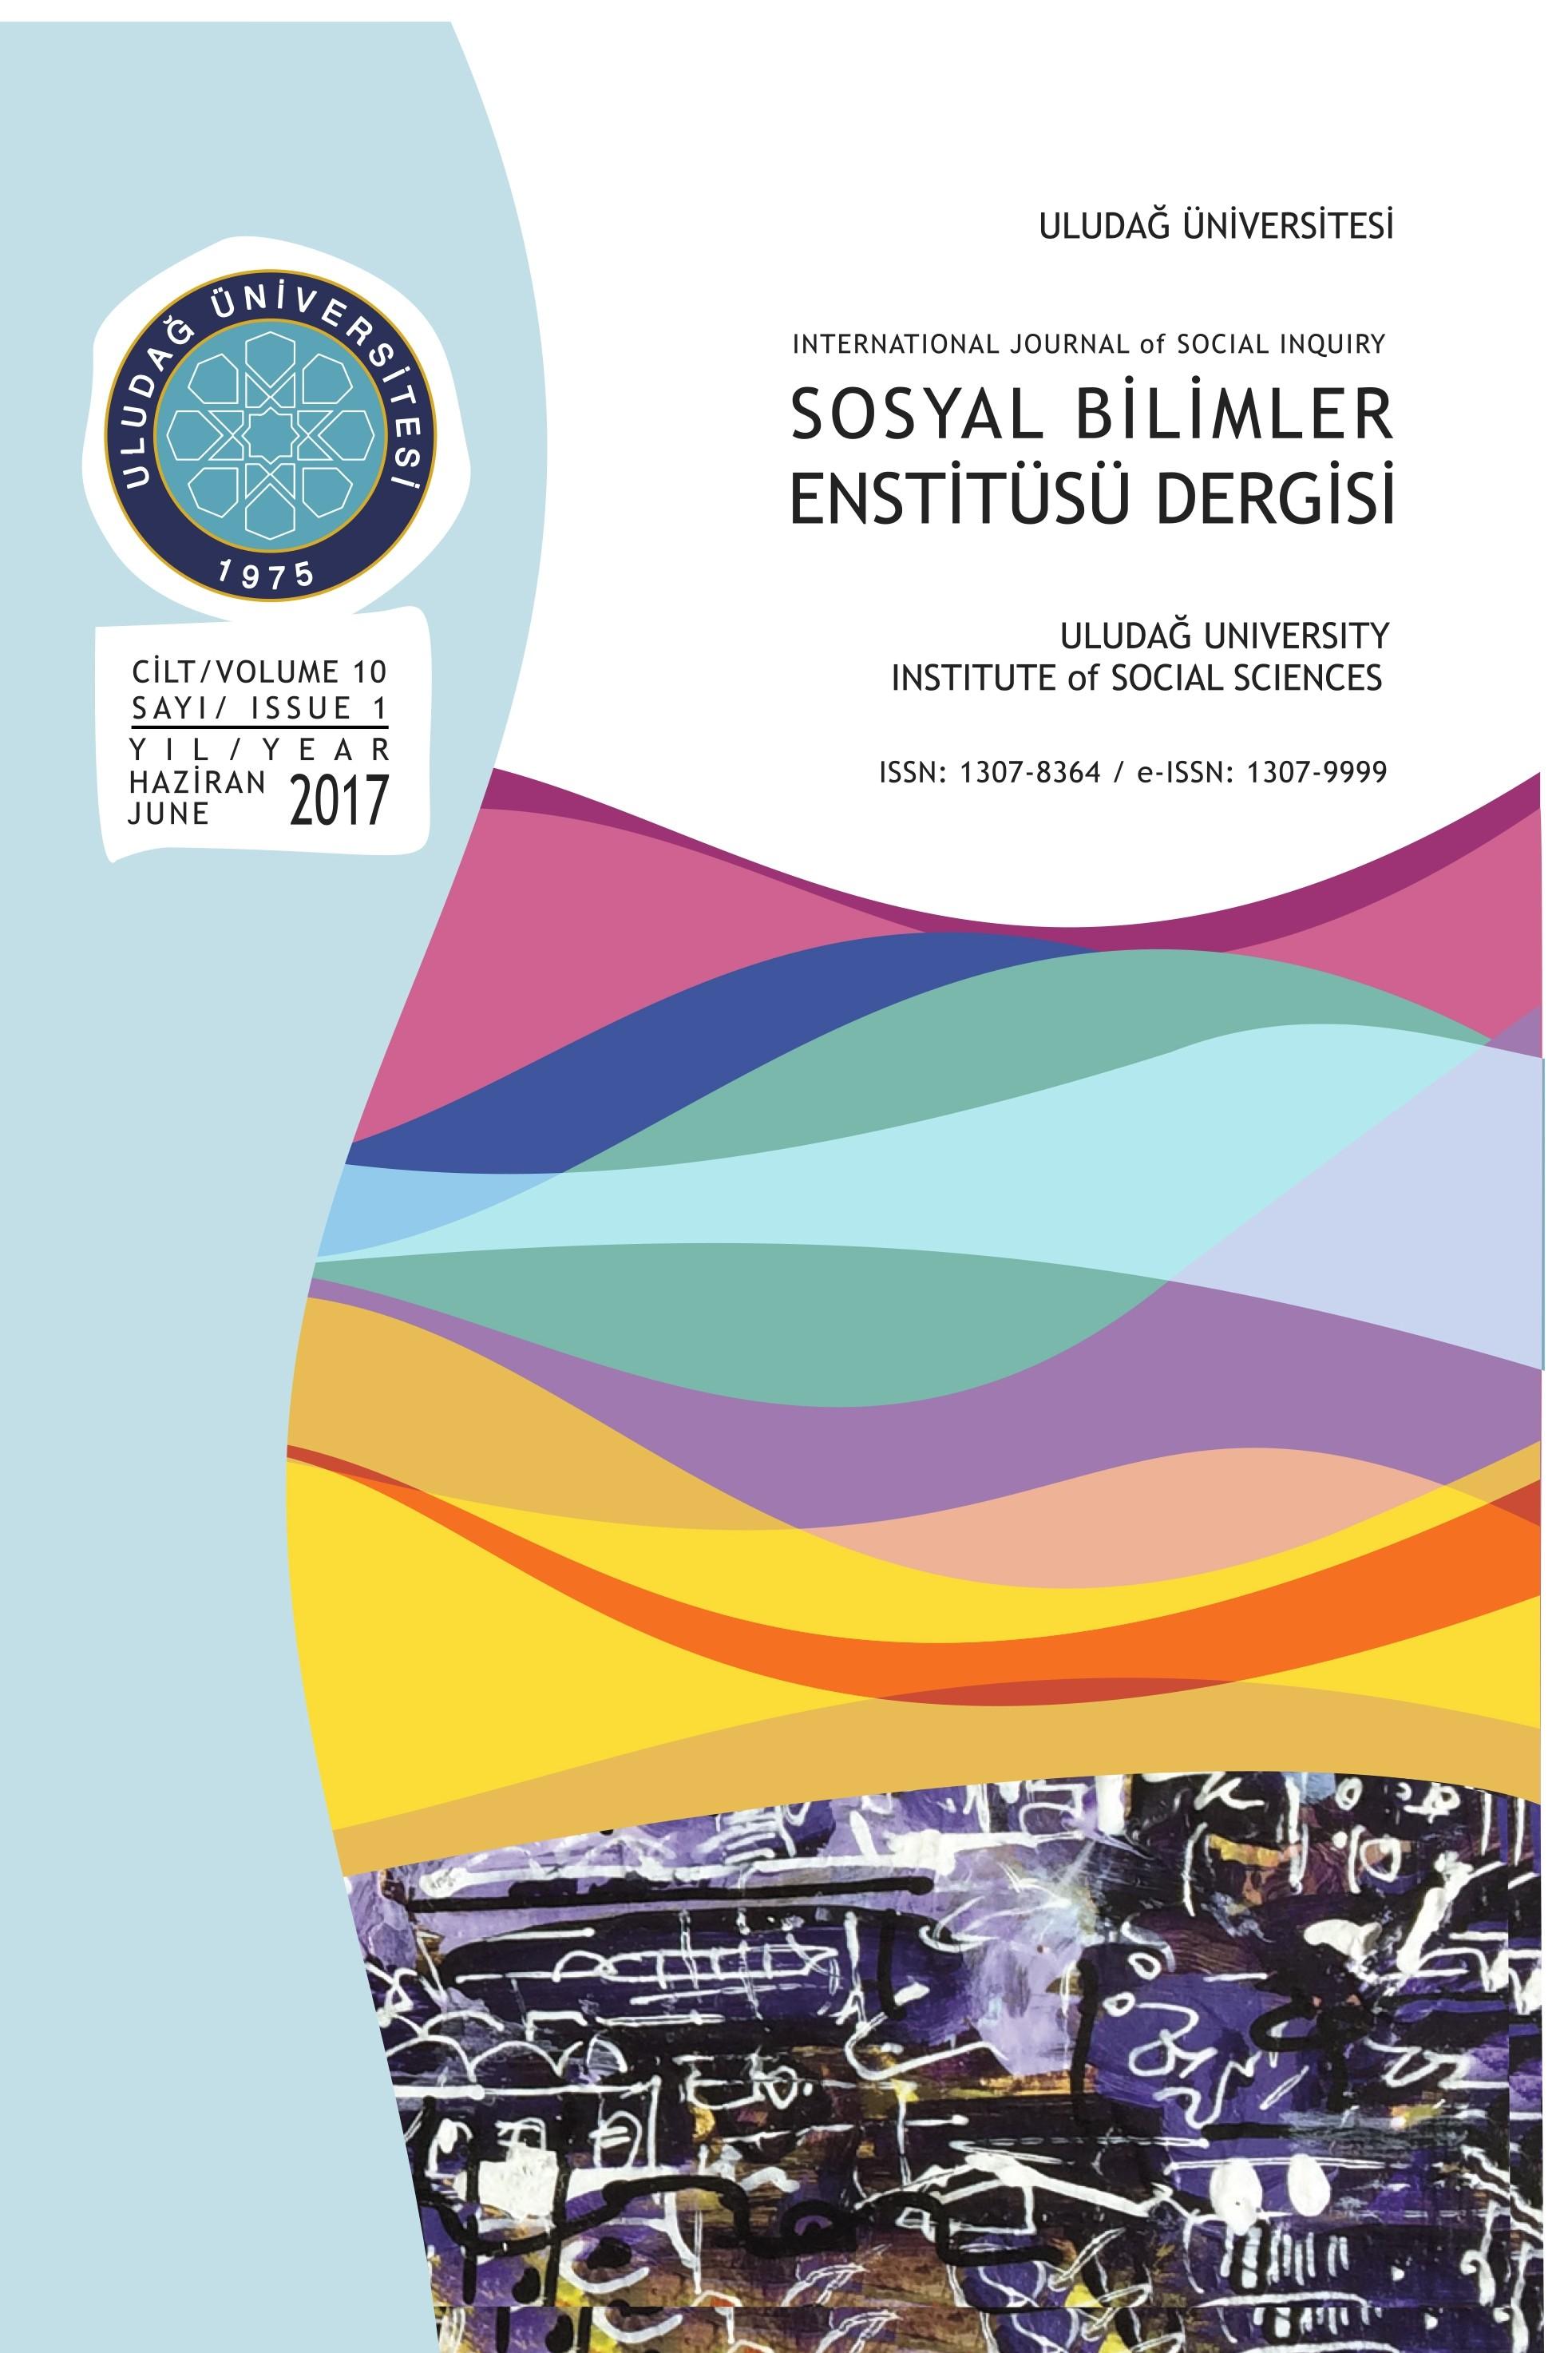 International Journal of Social Inquiry